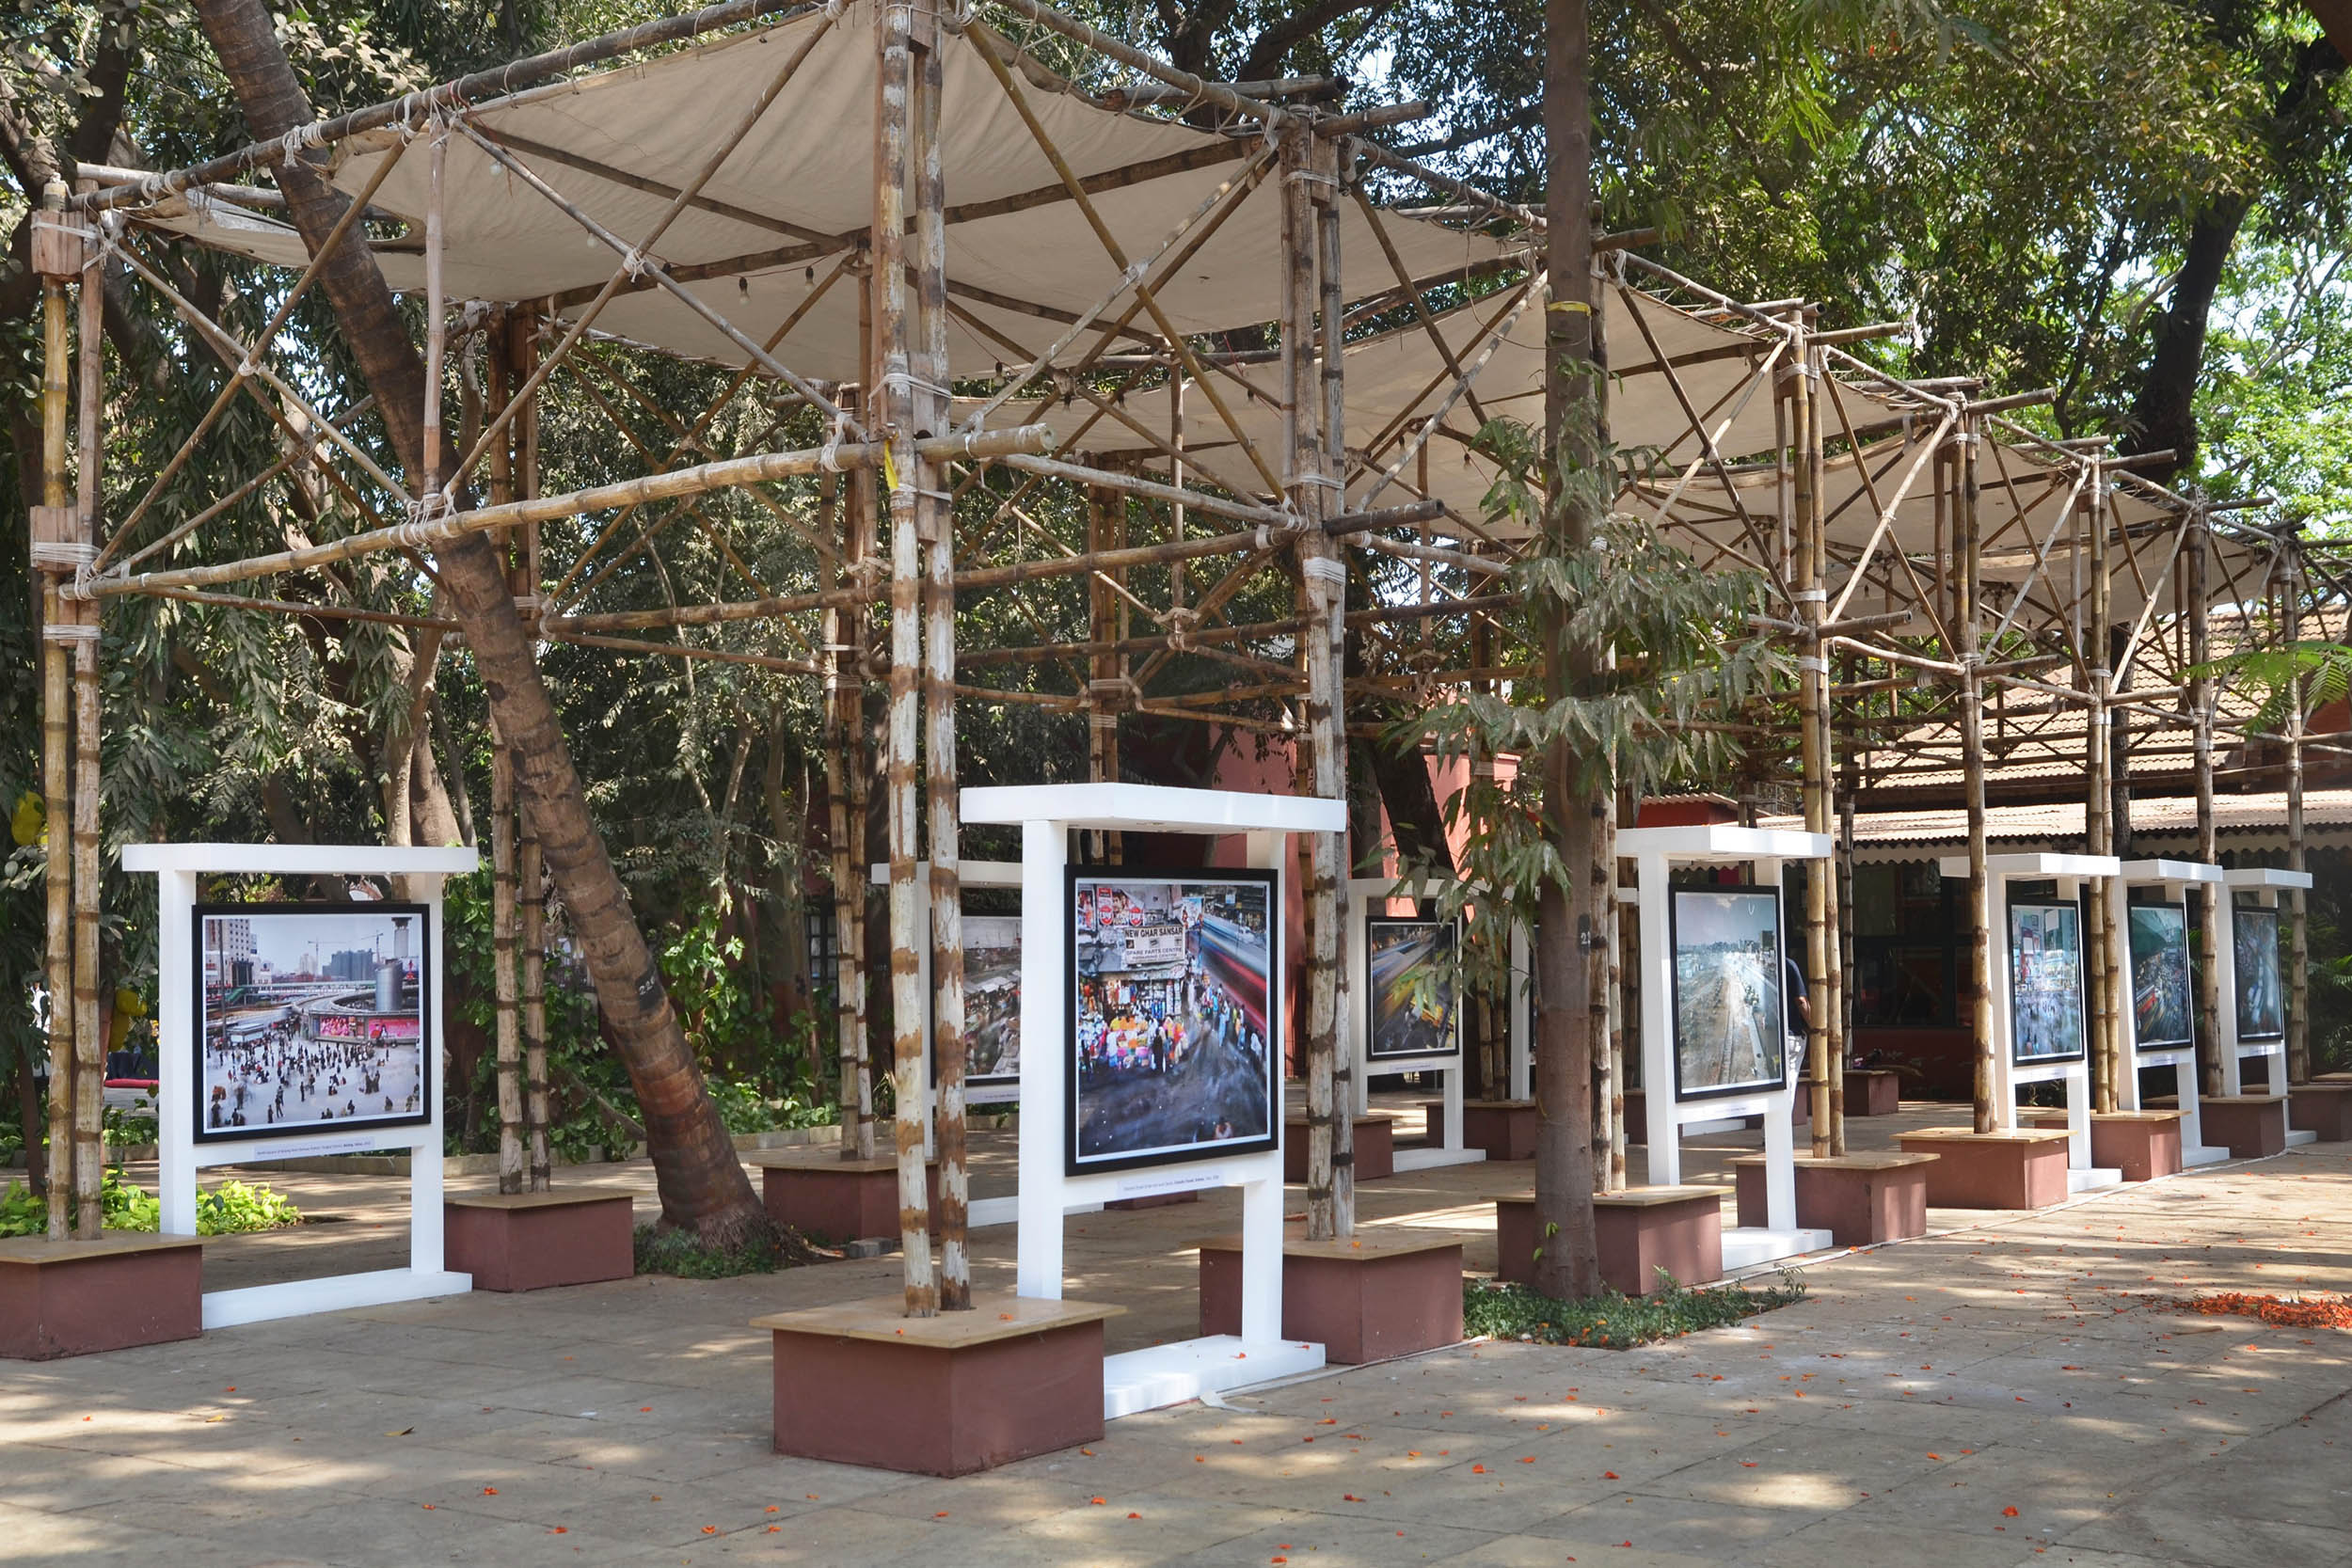 Dr. Bhau Daji Lad Mumbai City Museum, Mumbai